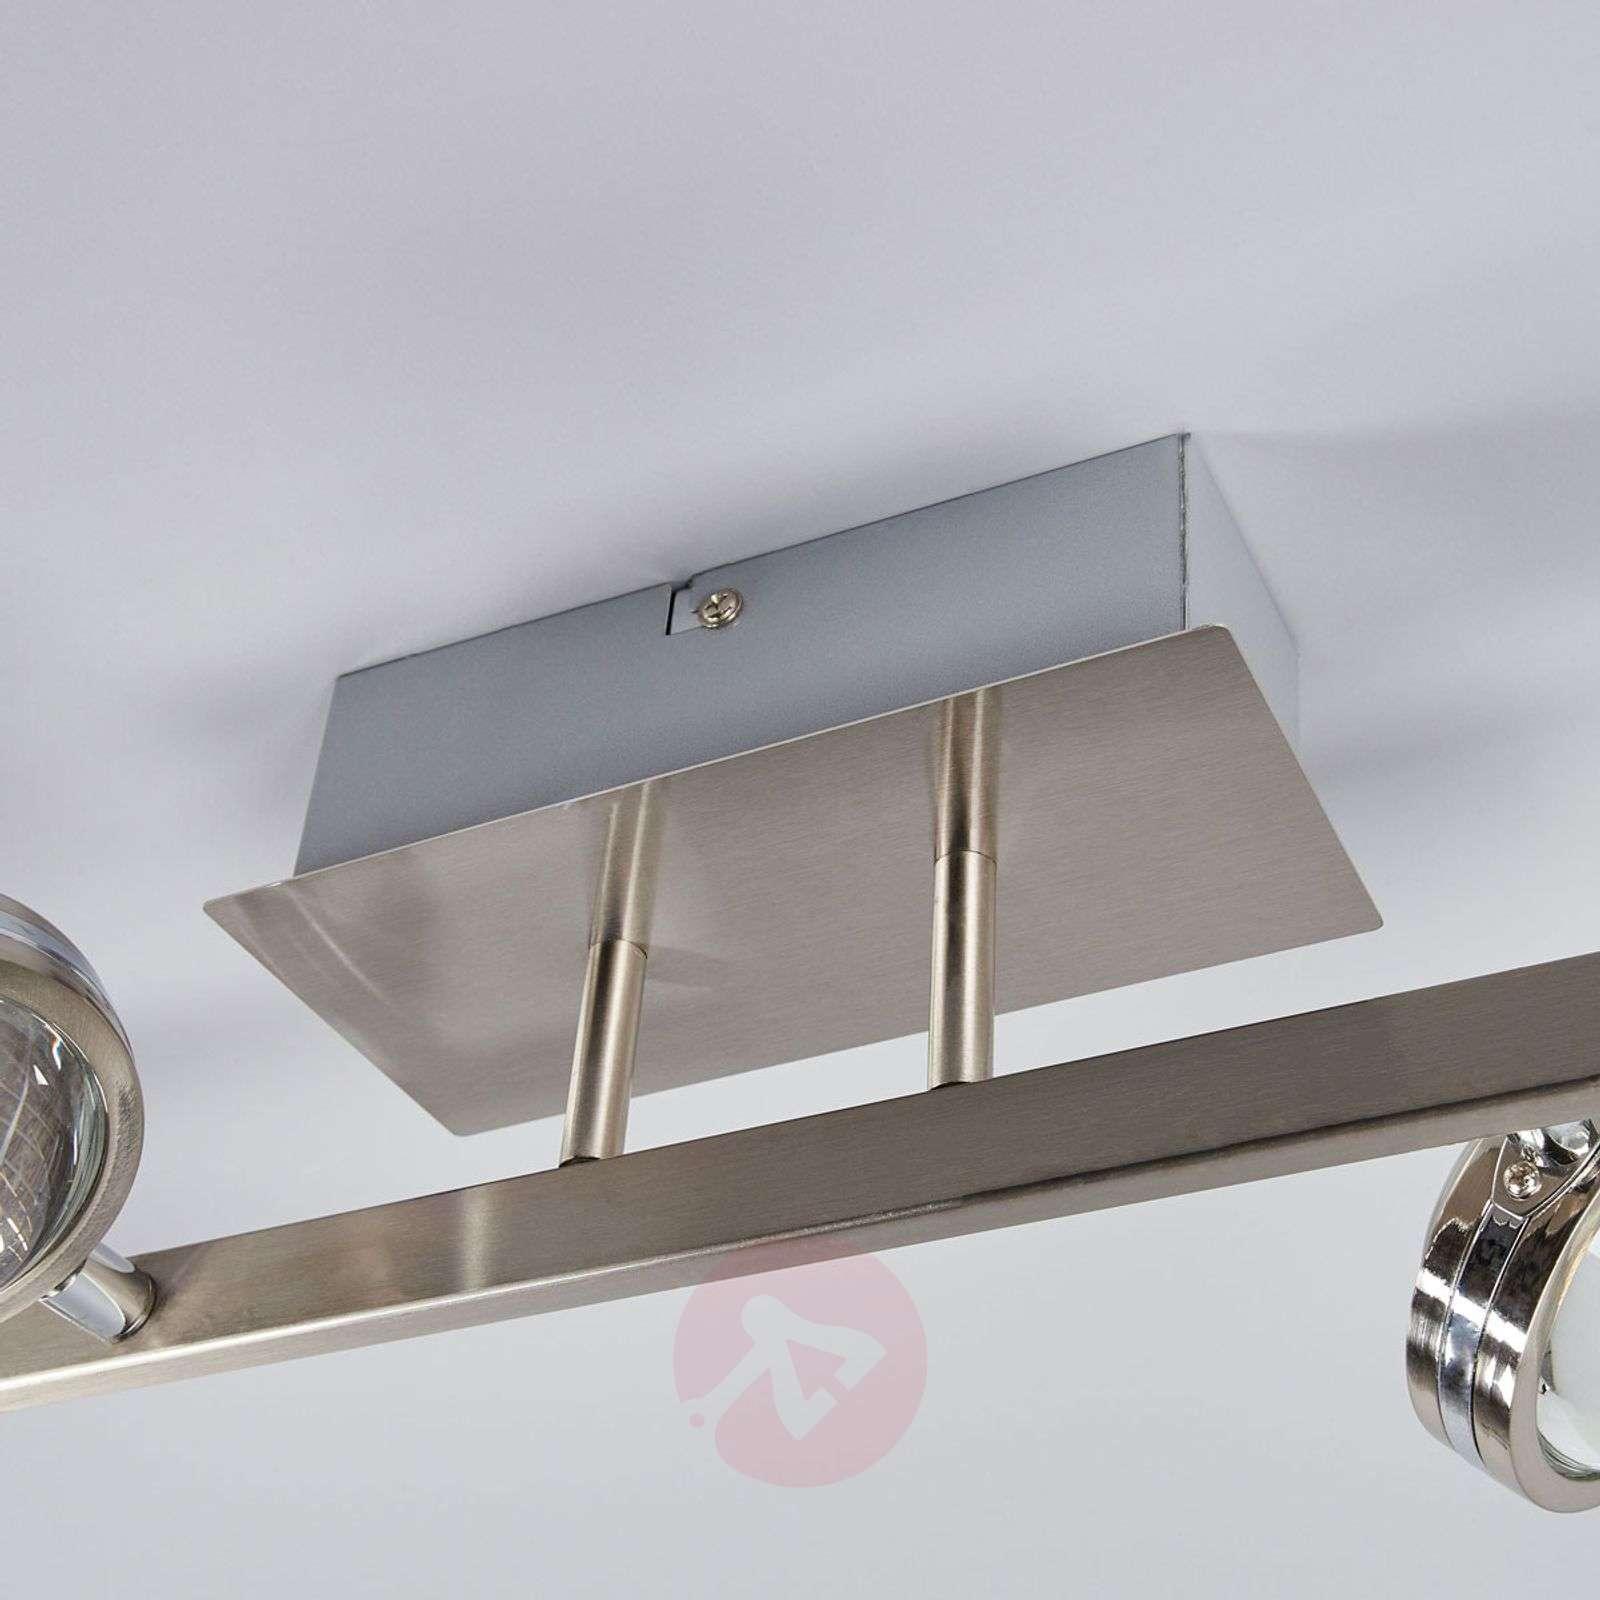 Pablos four-bulb LED ceiling light, chrome-9994125-01